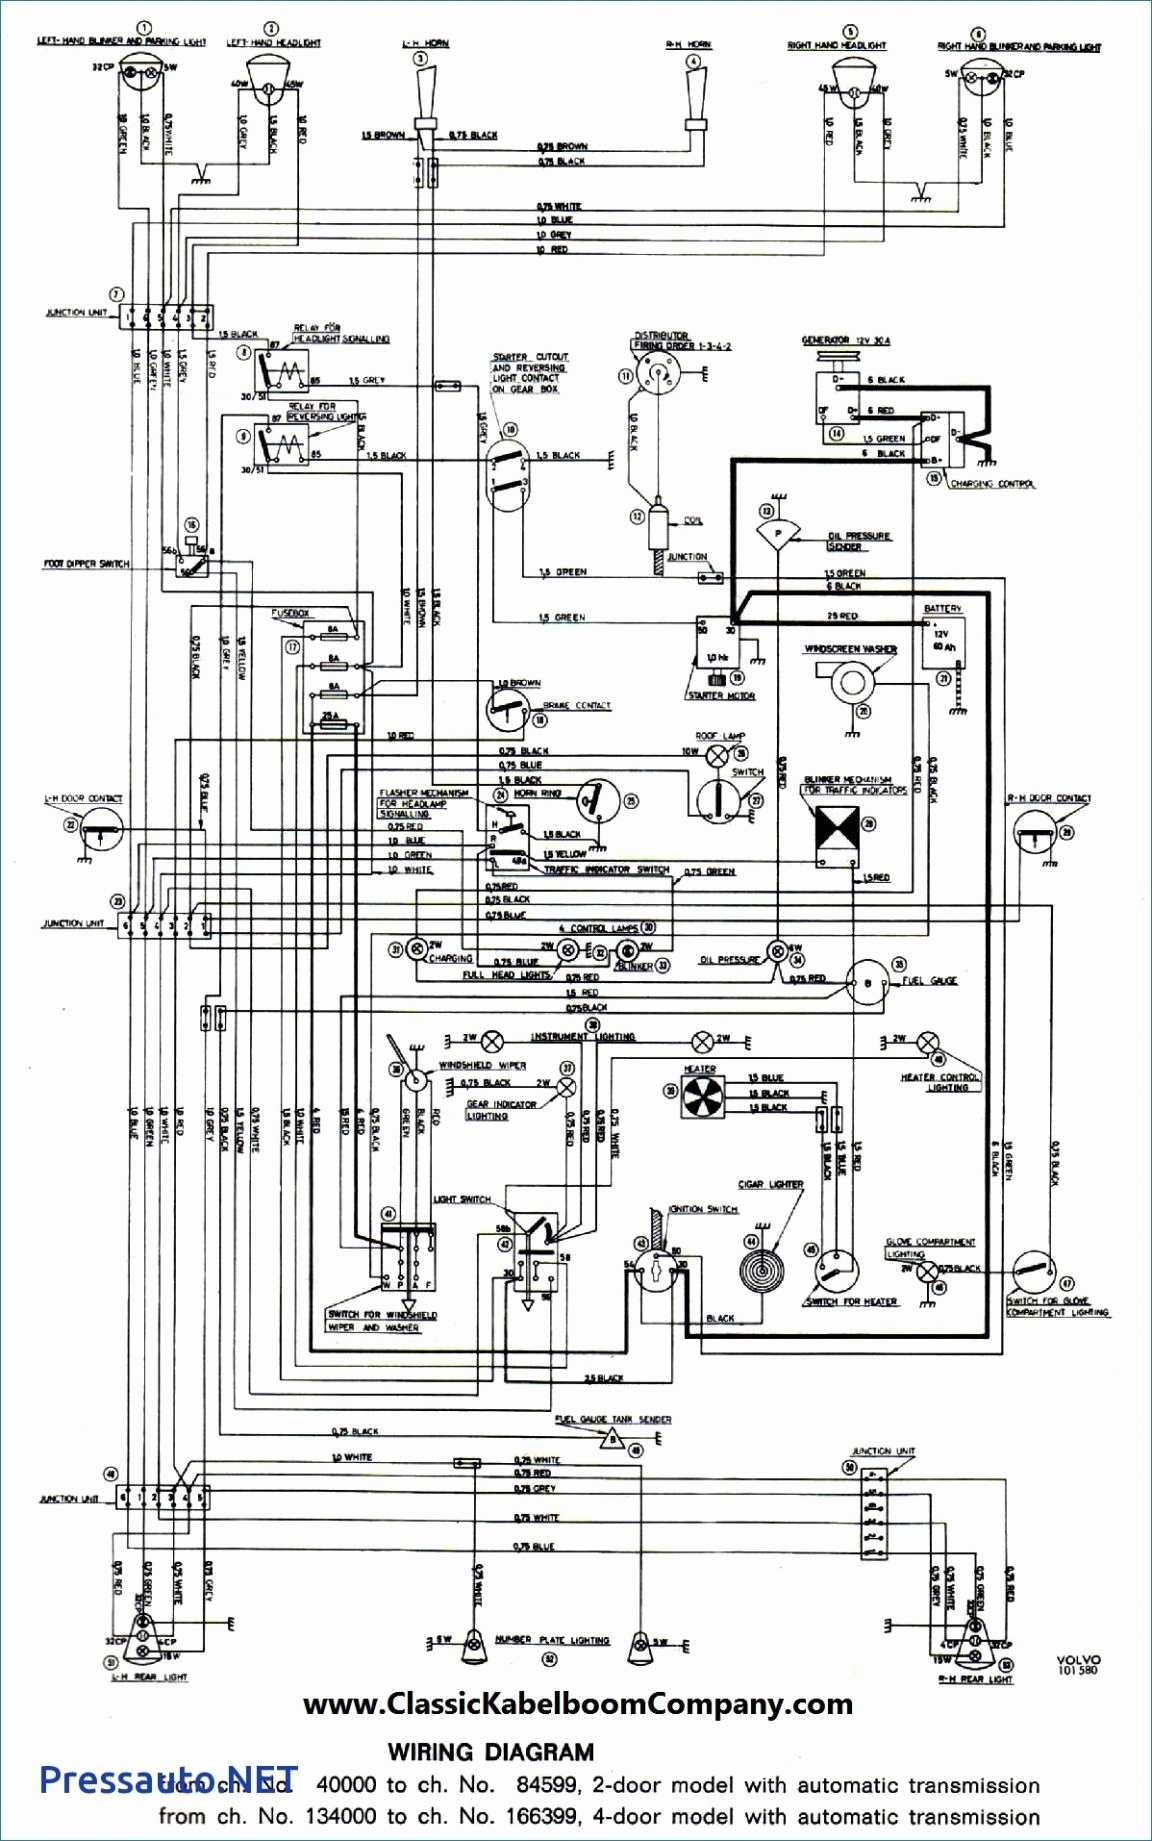 Brilliant Rv Automatic Transfer Switch Wiring Diagram Free Wiring Diagram Wiring Cloud Onicaalyptbenolwigegmohammedshrineorg